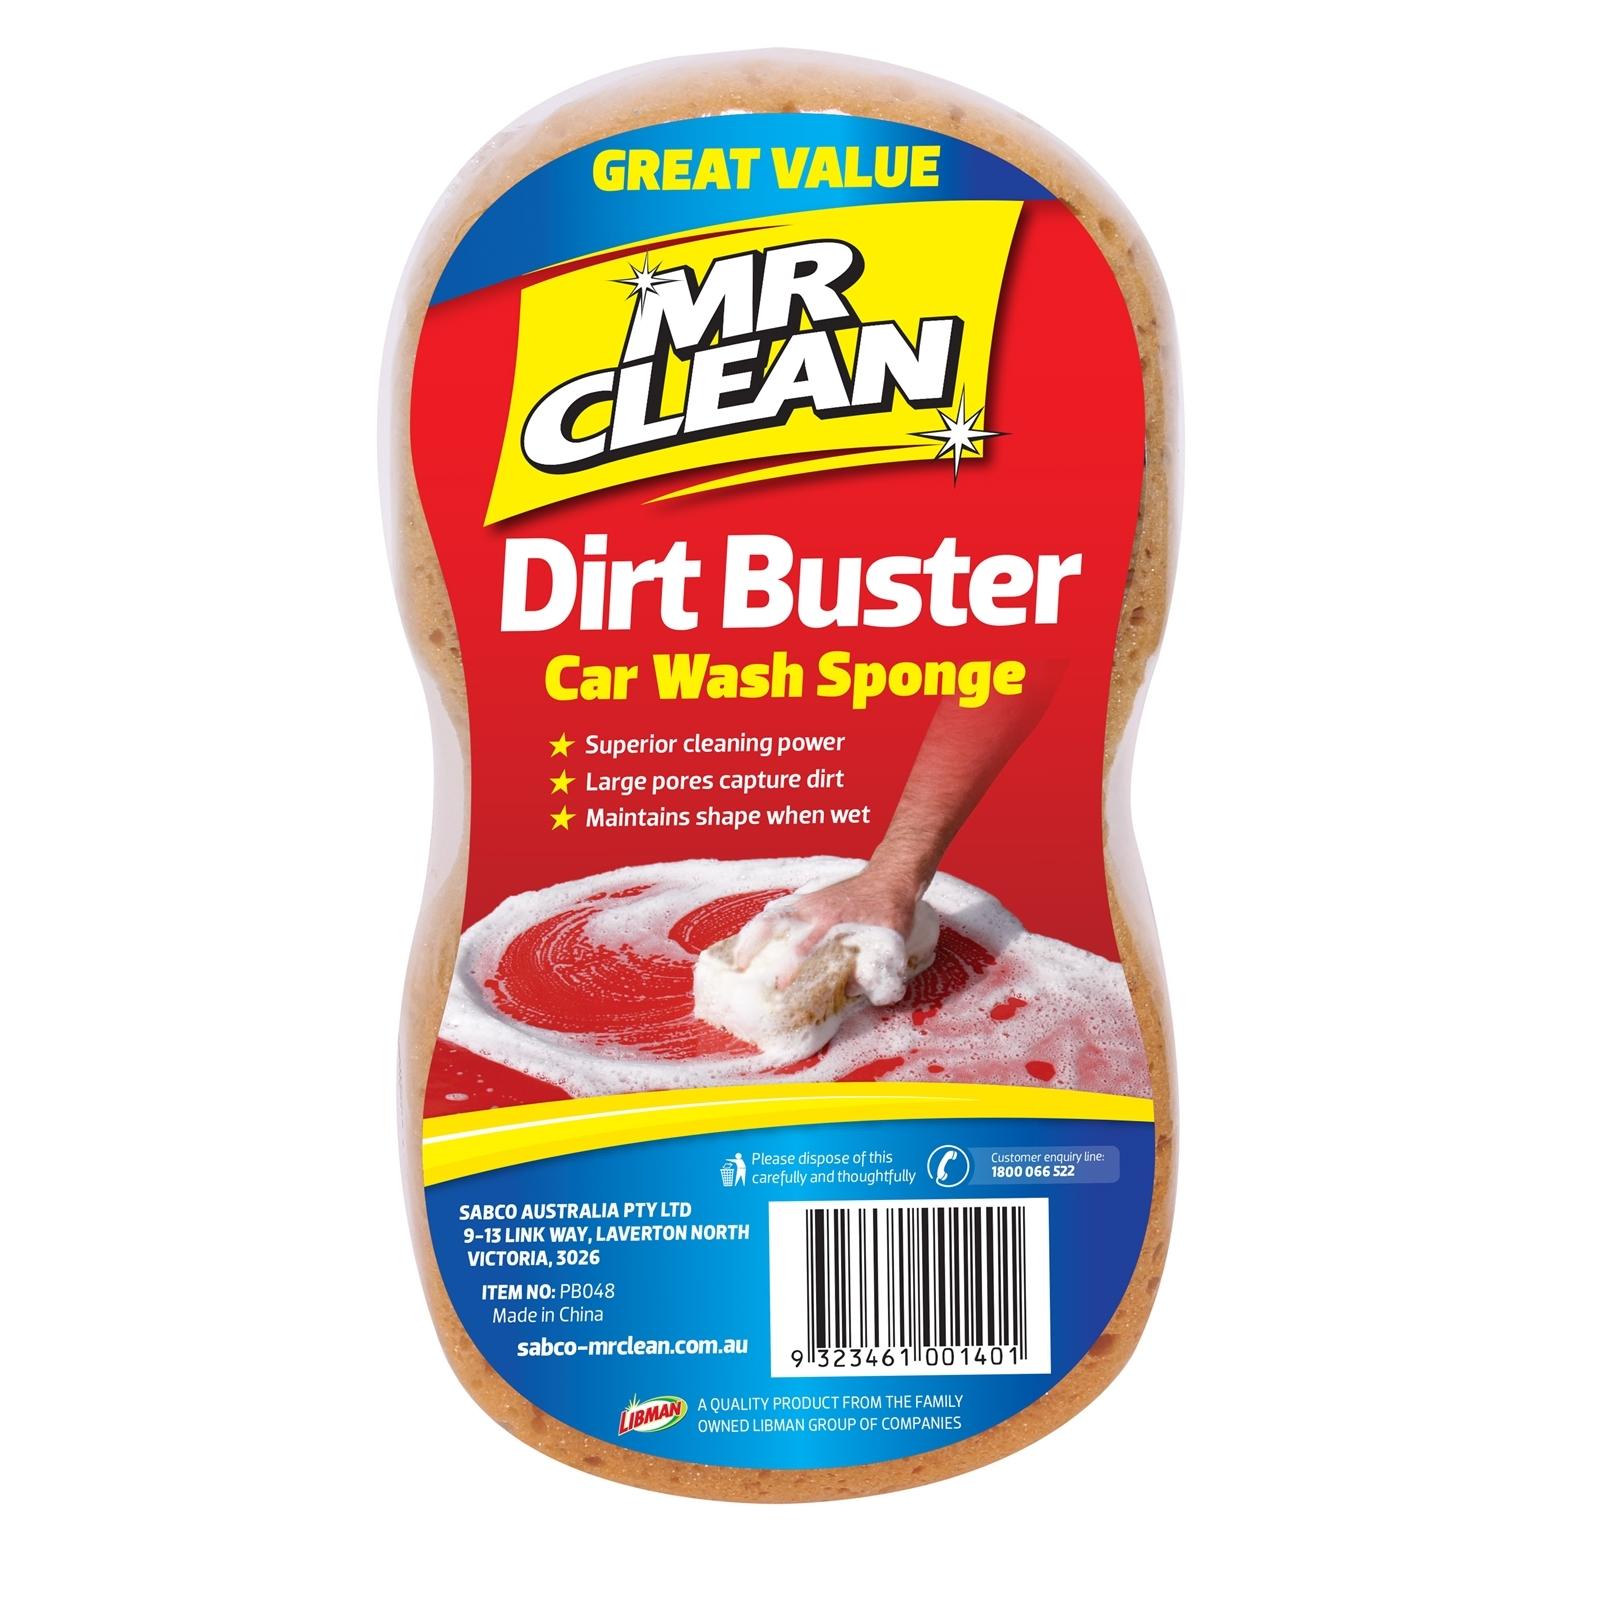 Mr Clean Dirt Buster Car Wash Sponge